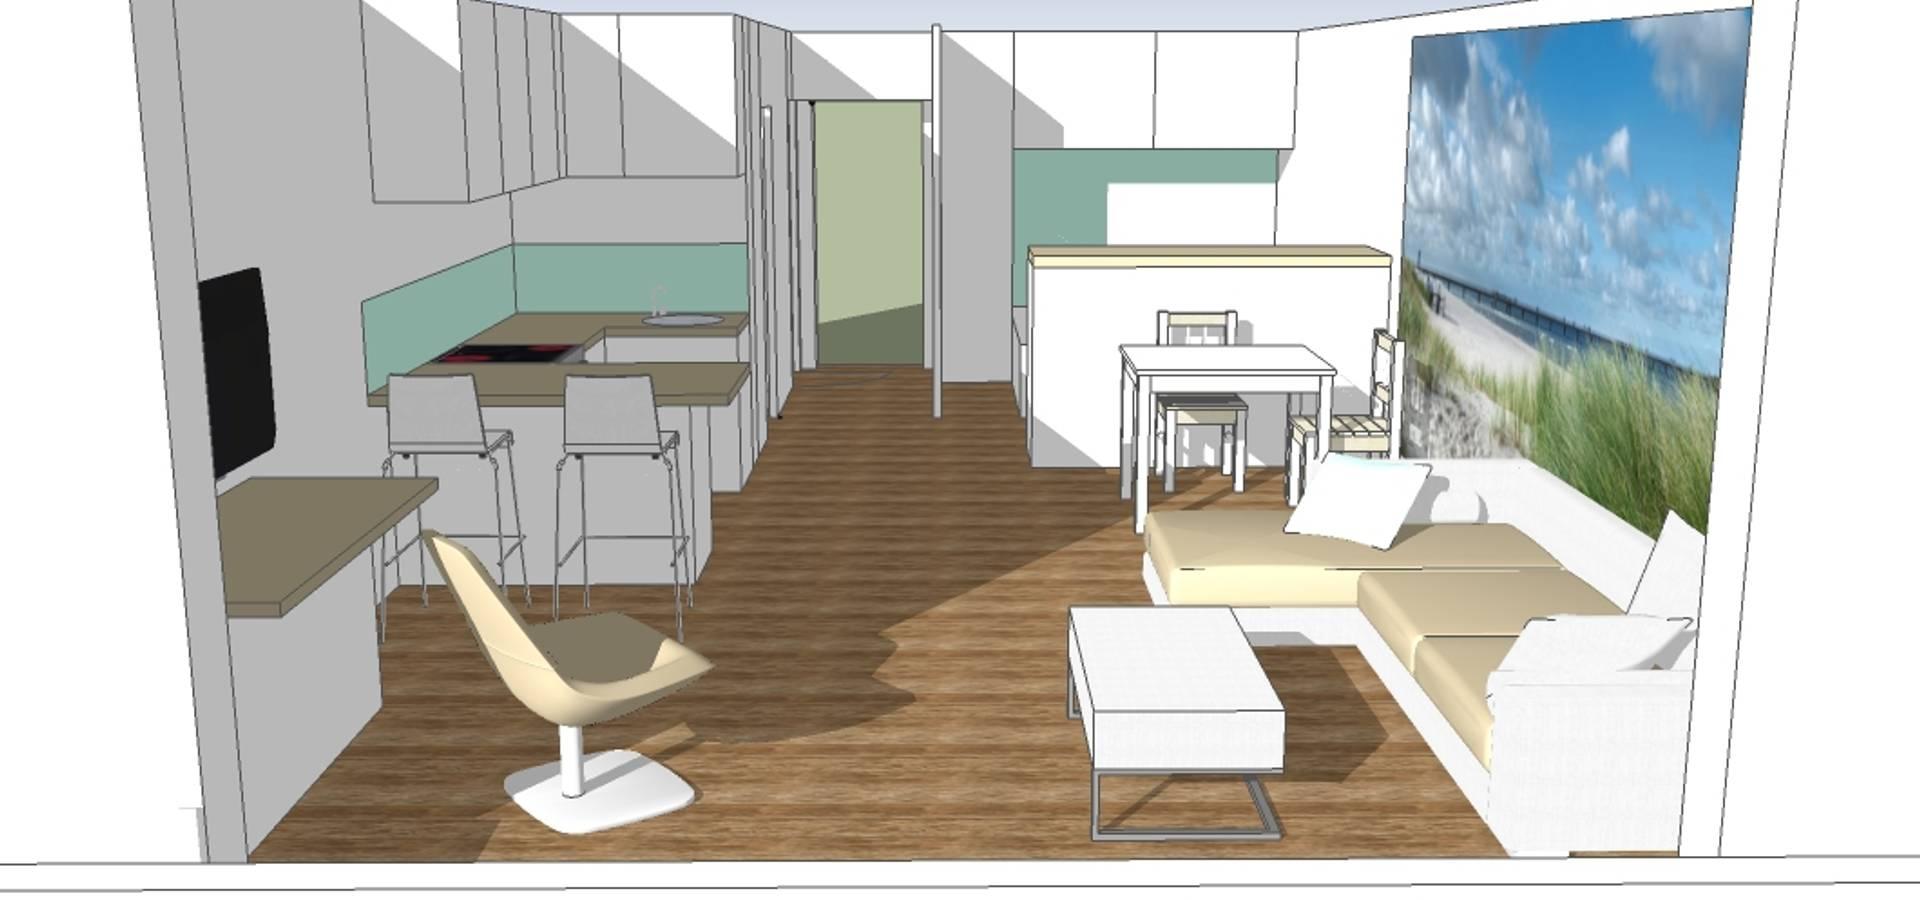 ferienwohnung an der ostsee de raumplanung online homify. Black Bedroom Furniture Sets. Home Design Ideas